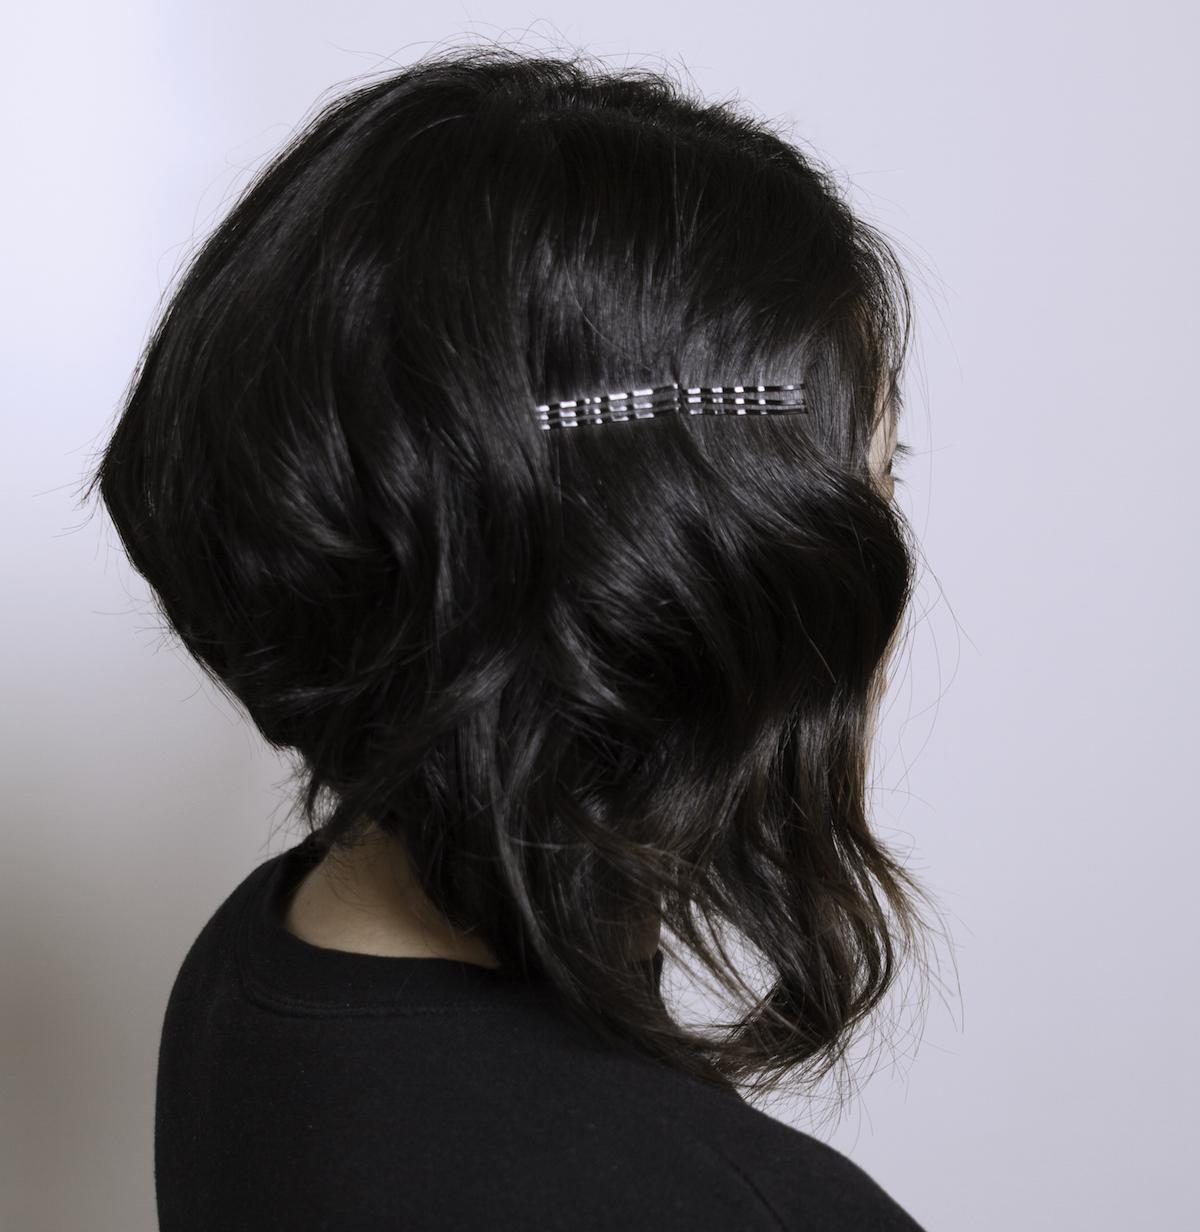 Style by Michelle Lee/Photo courtesy of Salon Eva Michelle